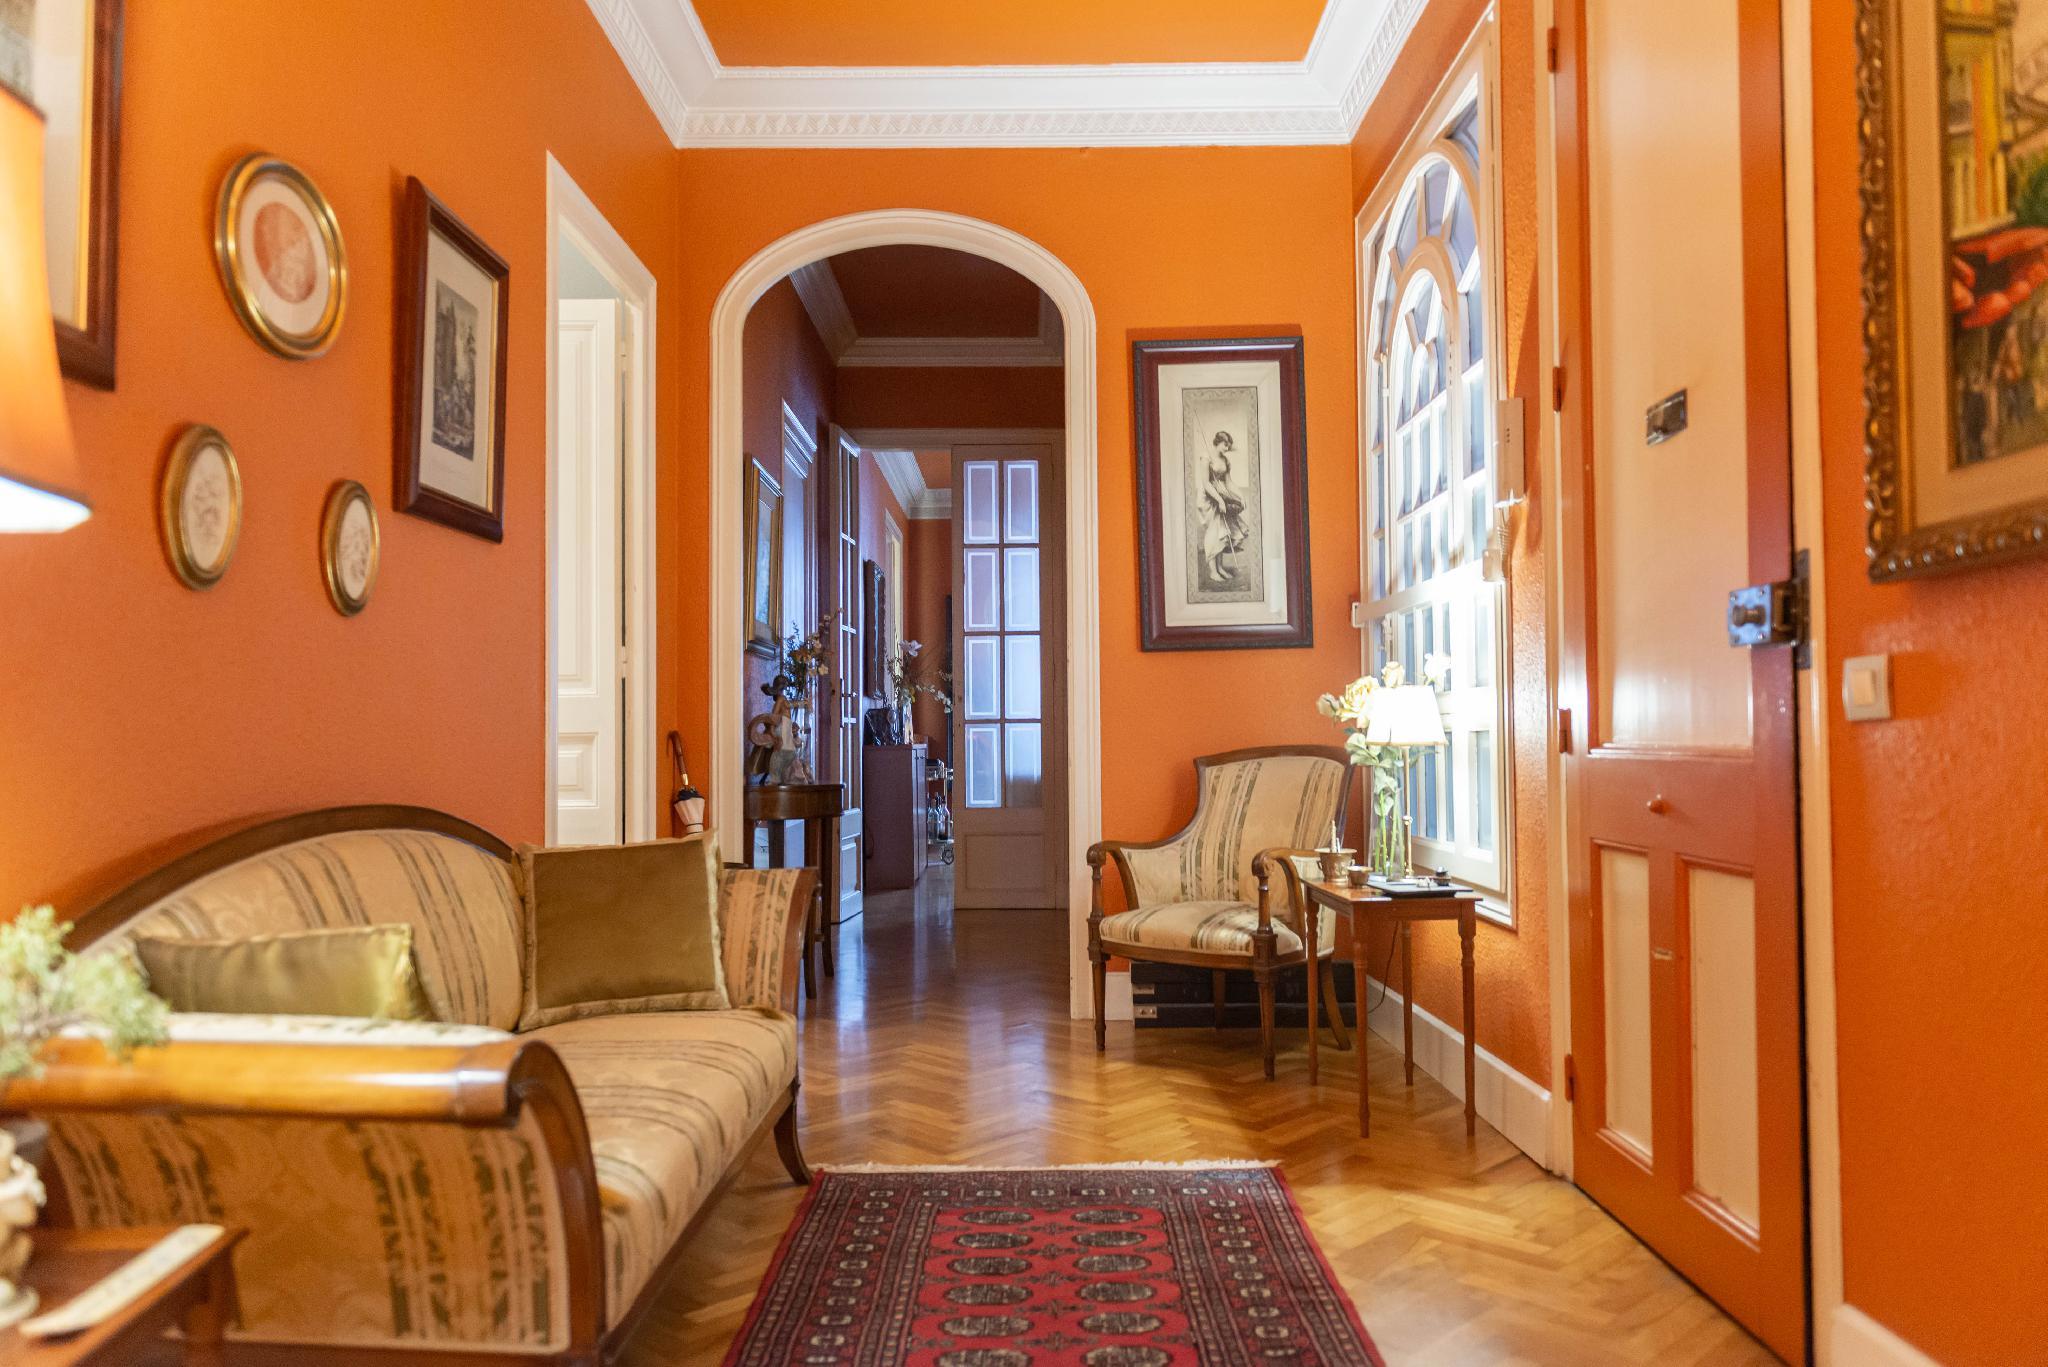 166582 Flat for sale in Eixample, Dreta Eixample 3